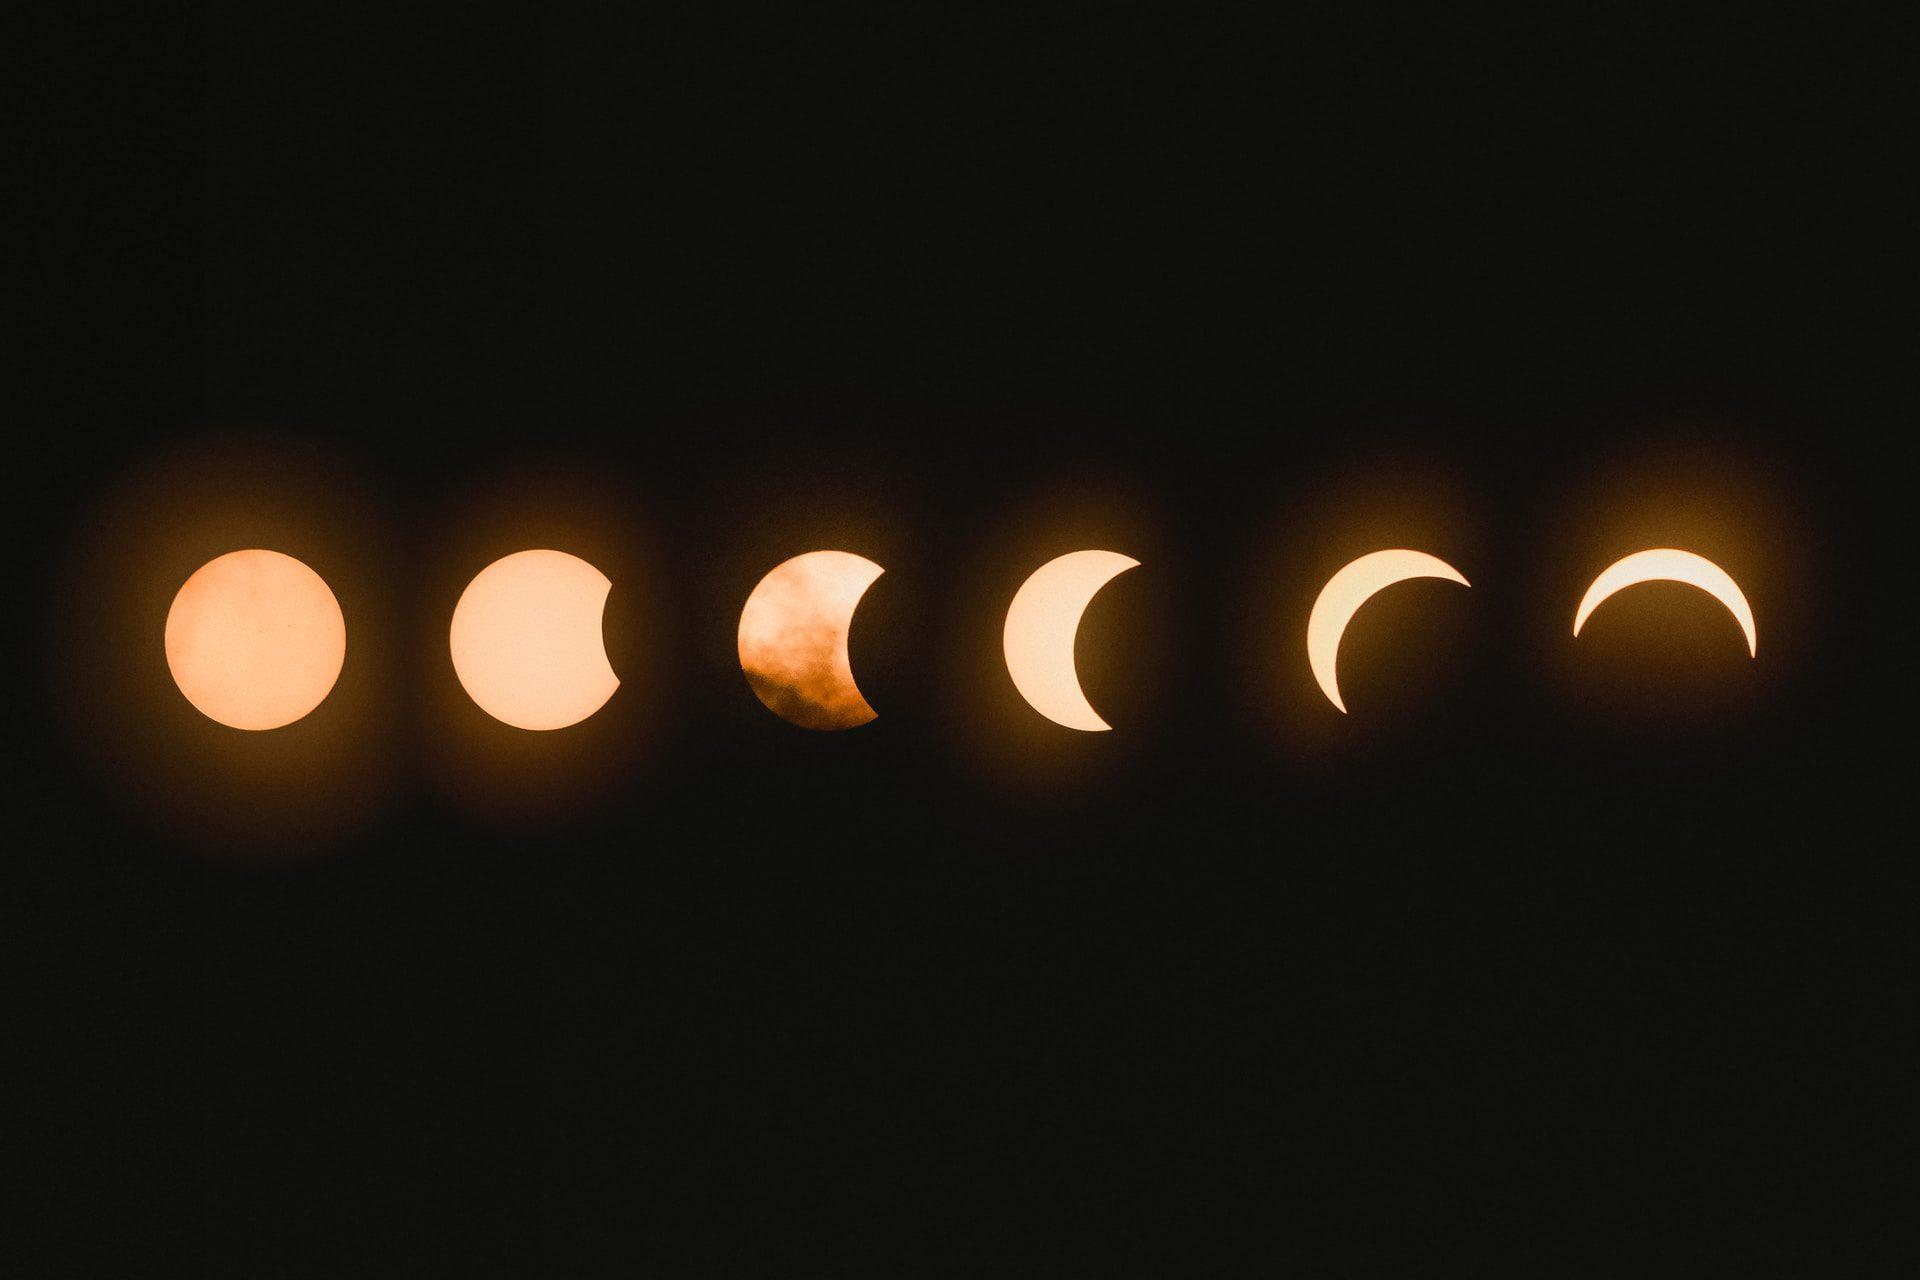 Ay Burcunuzu Bilmeniz Gereken 3 Onemli Neden Ay Burclari